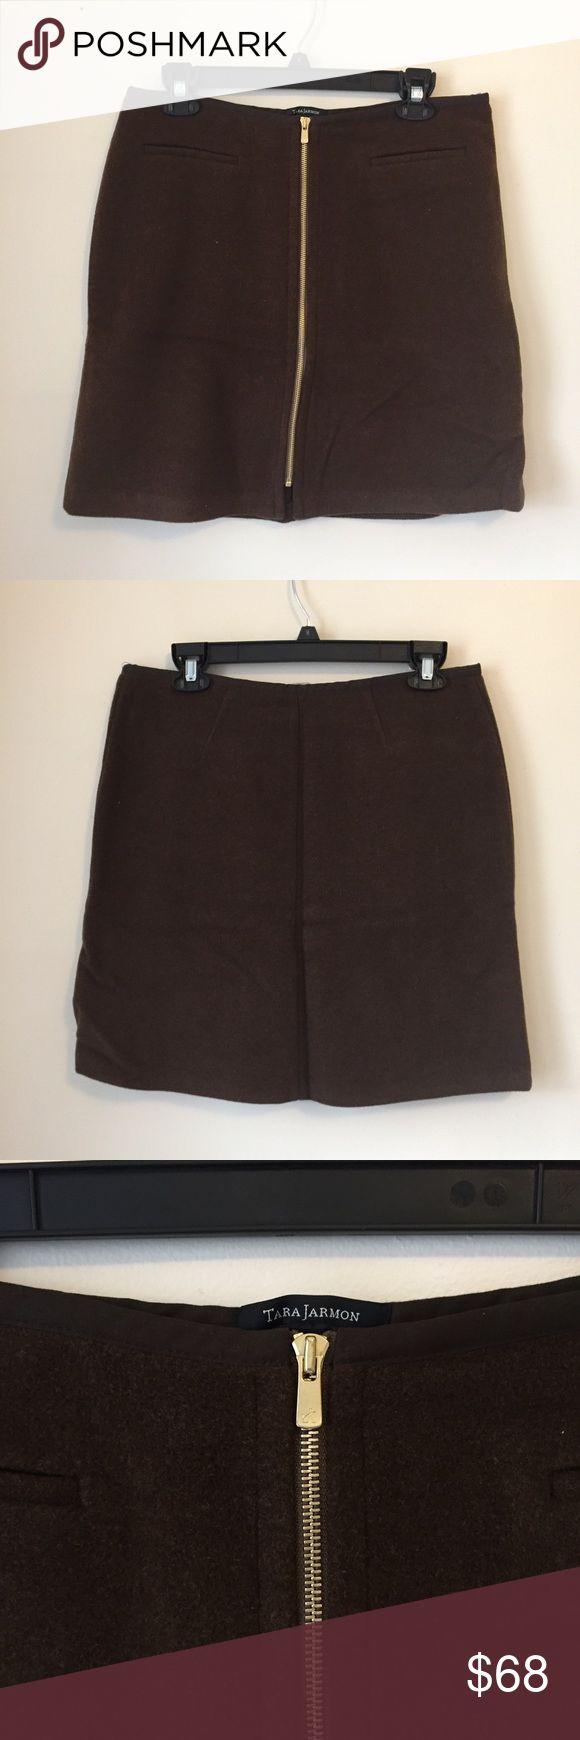 Tara Jarmon Brown Wool Front Zip Skirt 40 Tara Jarmon brown wool skirt with full front zip. 80% wool, 20% nylon. Fairly thick construction.  Size 40, translates to US 8 per Tara Jarmon site. Excellent condition. Tara Jarmon Skirts Mini